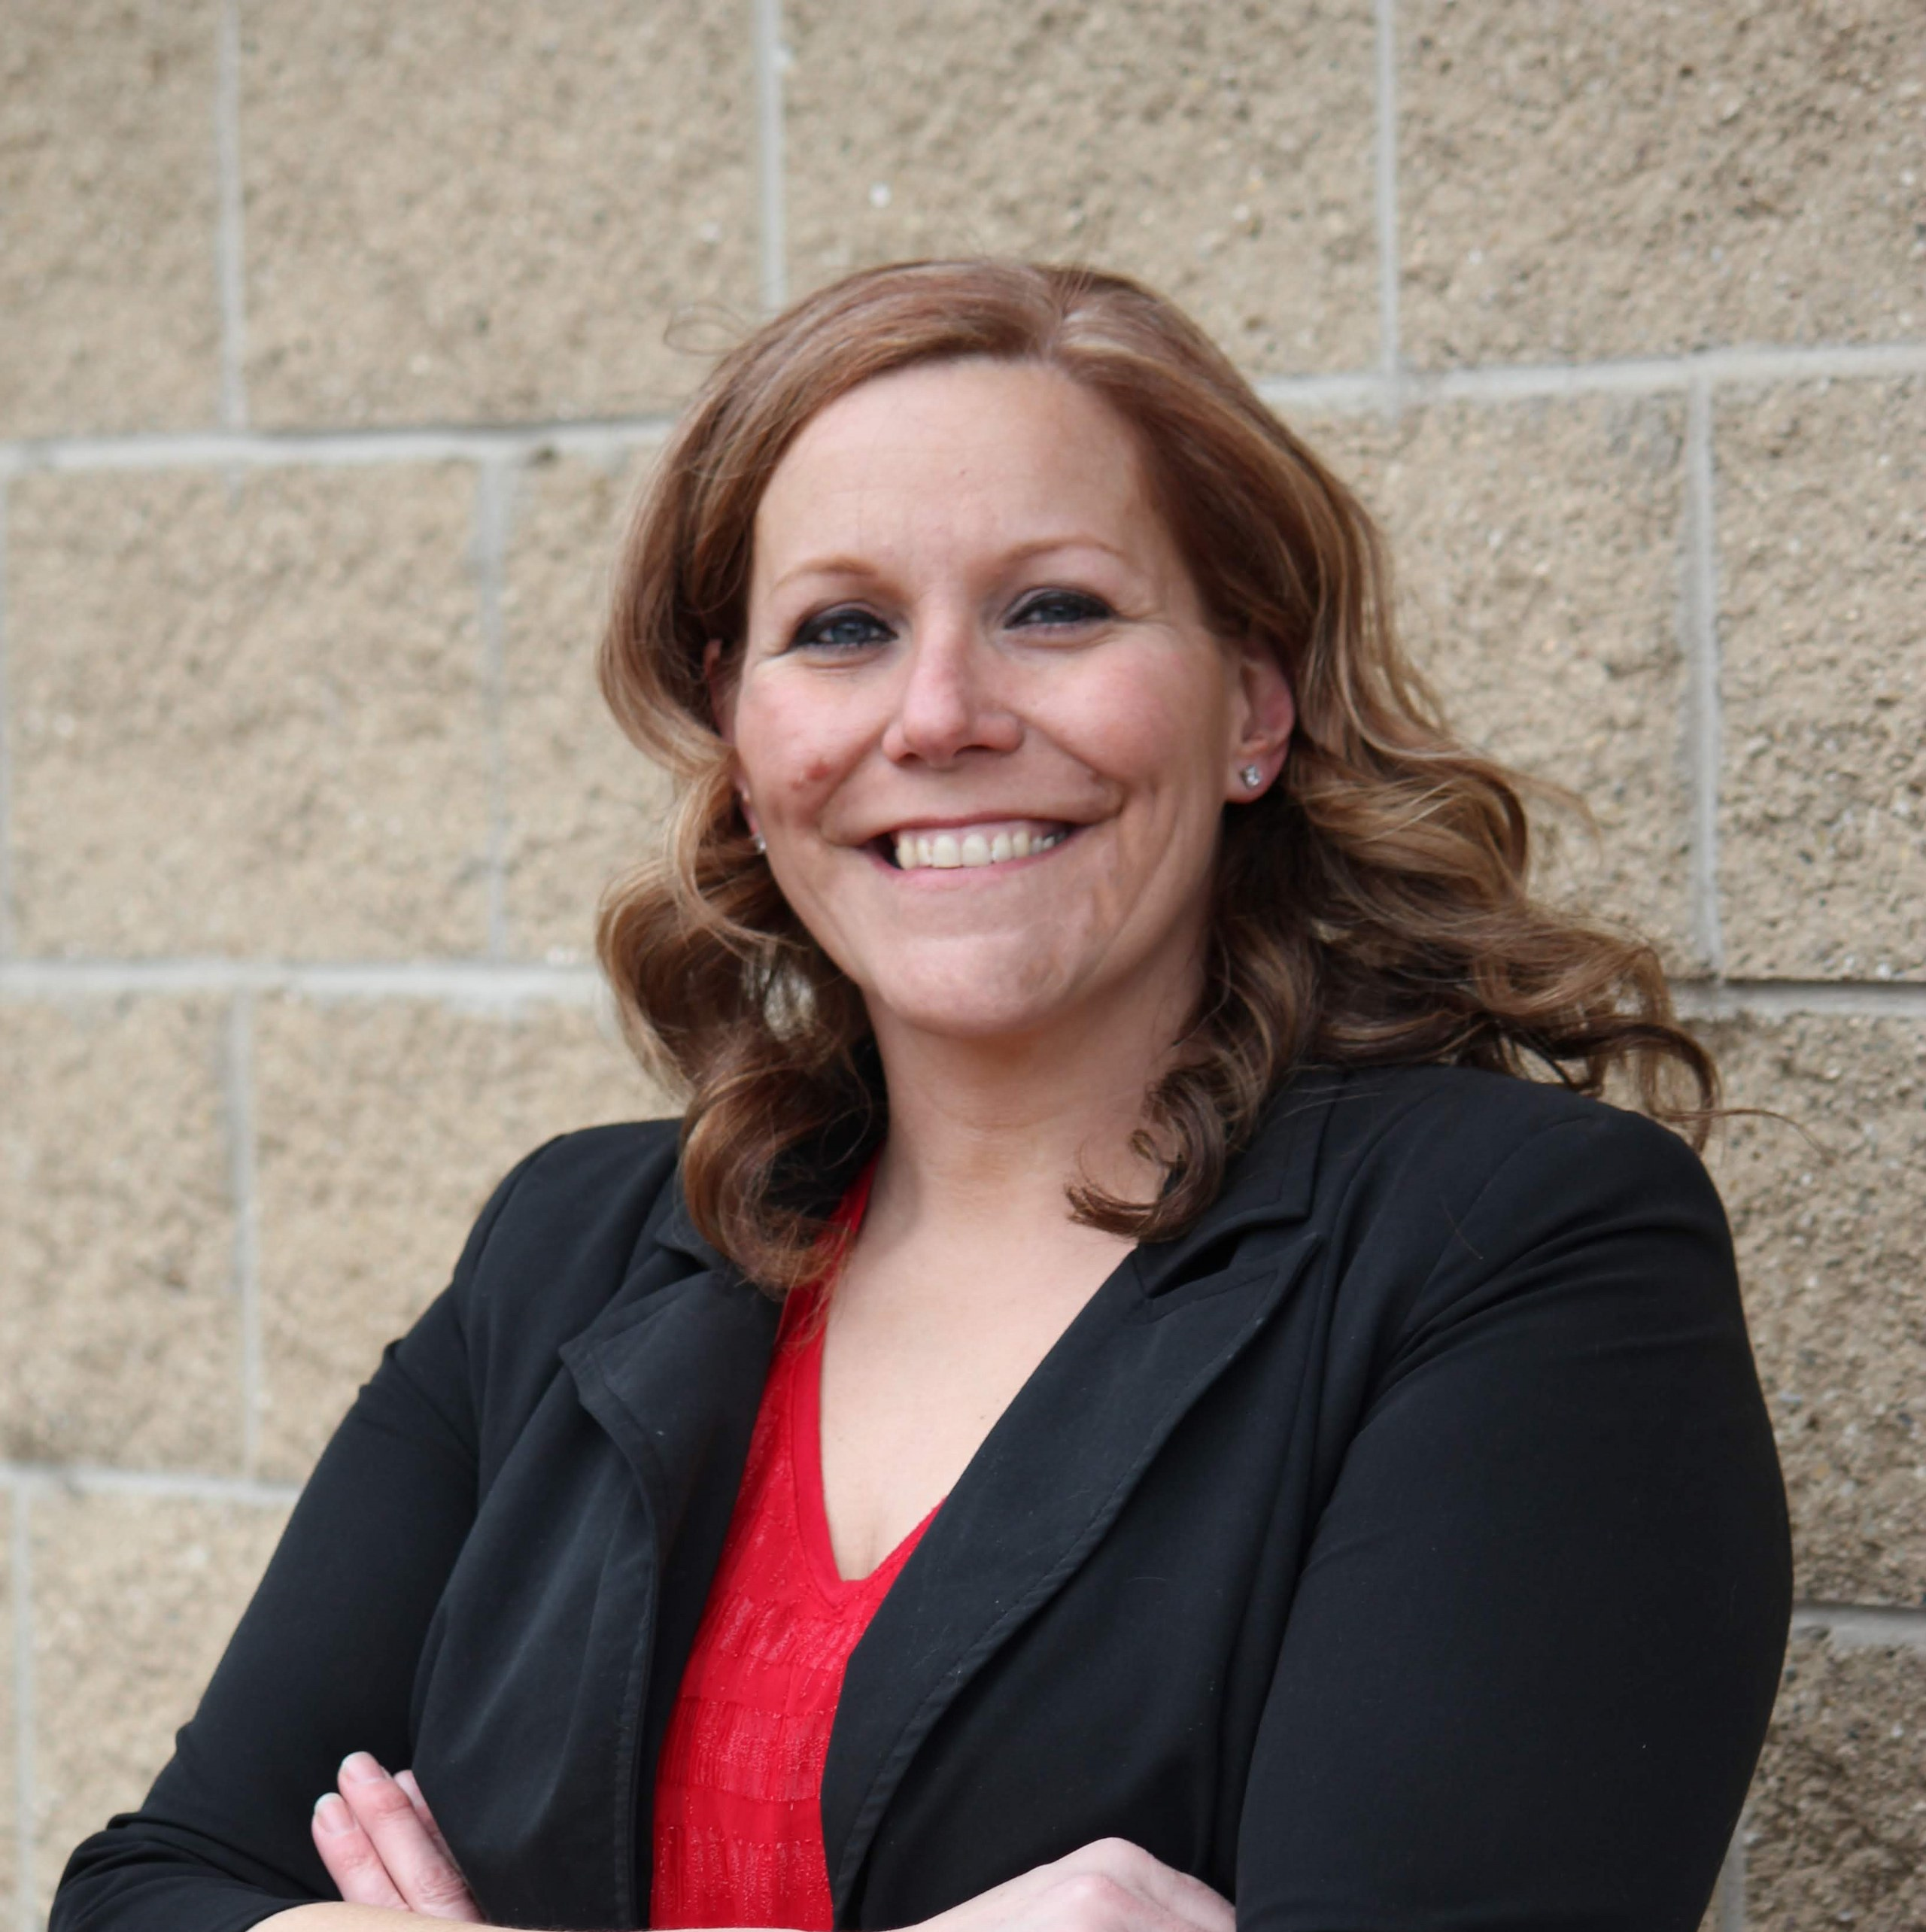 Cindy Brackemeyer